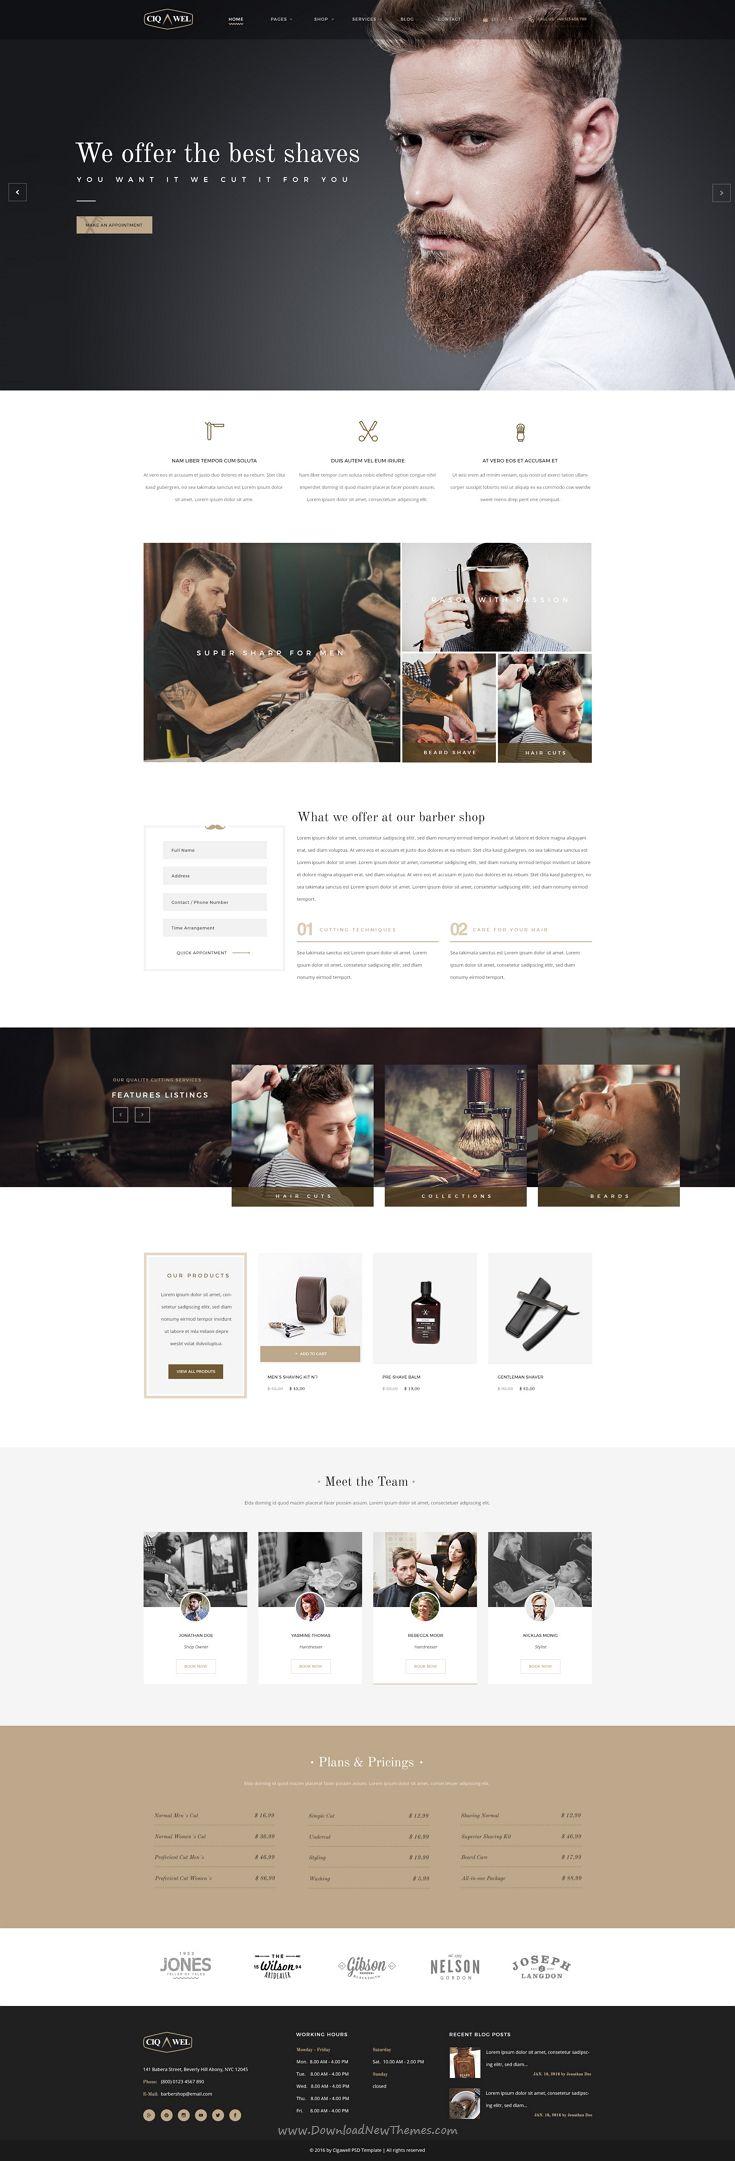 17 best ideas about Salon Website on Pinterest | Beauty salon ...